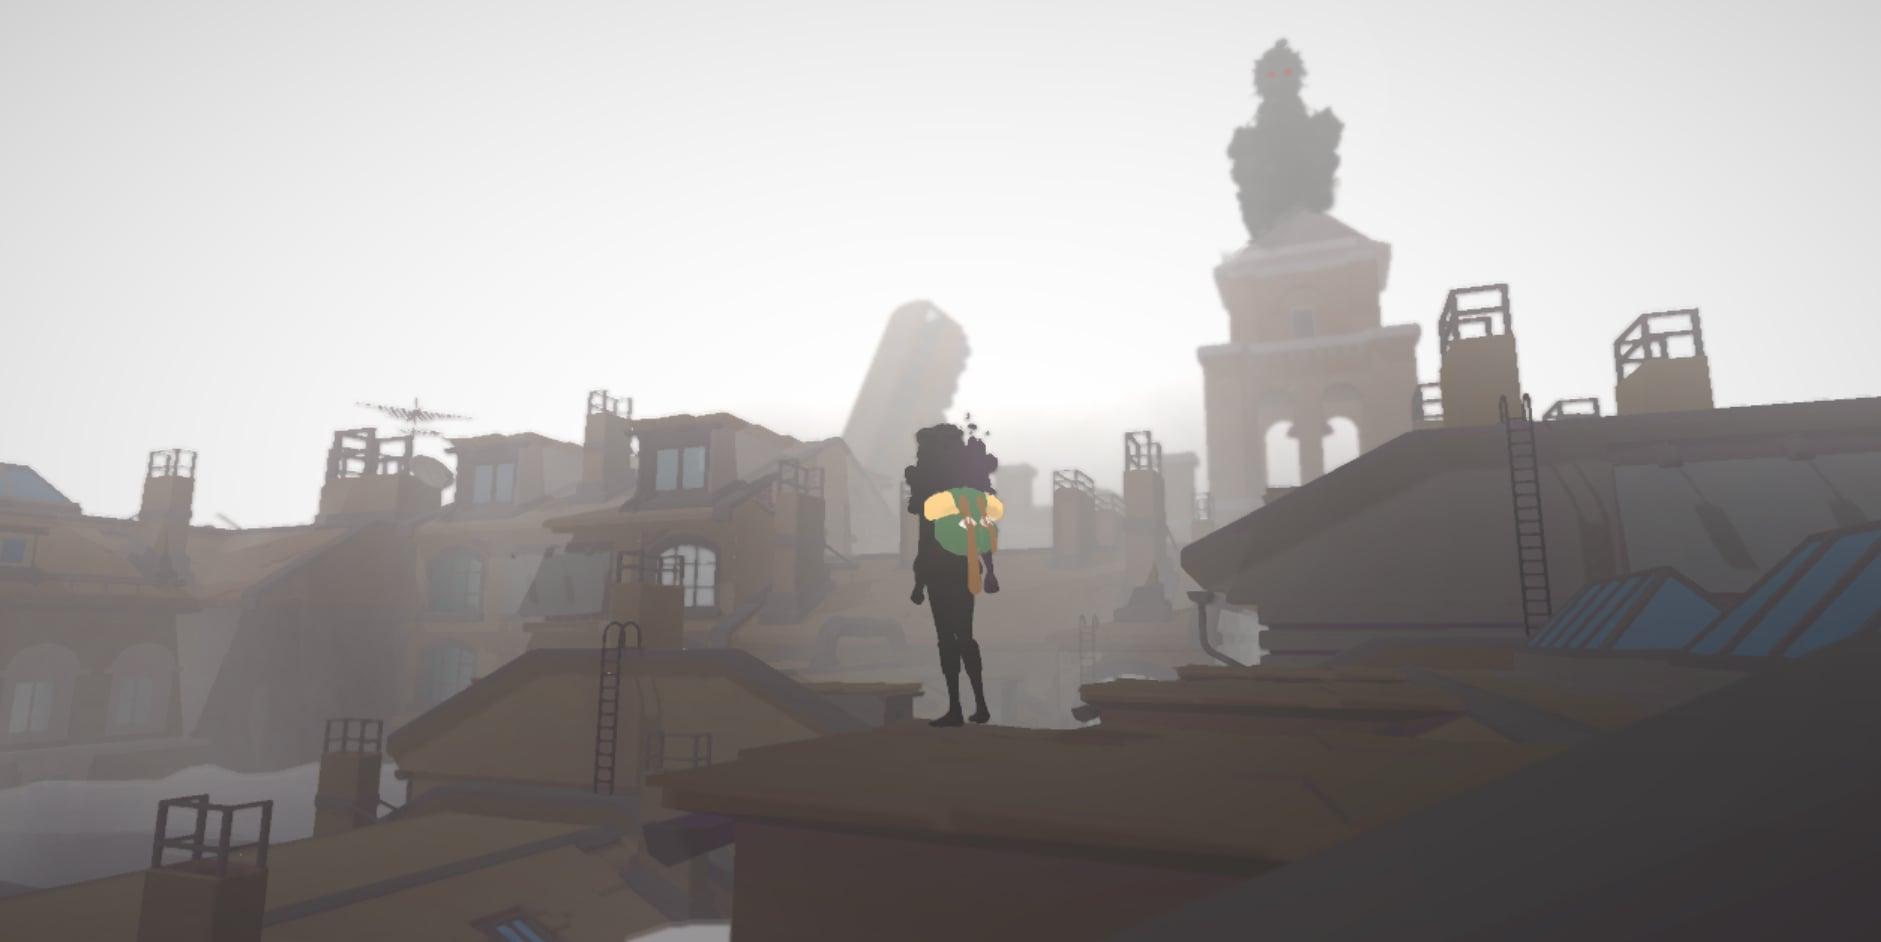 sea_of_solitude_jo-mei_games_screenshot_5.jpg